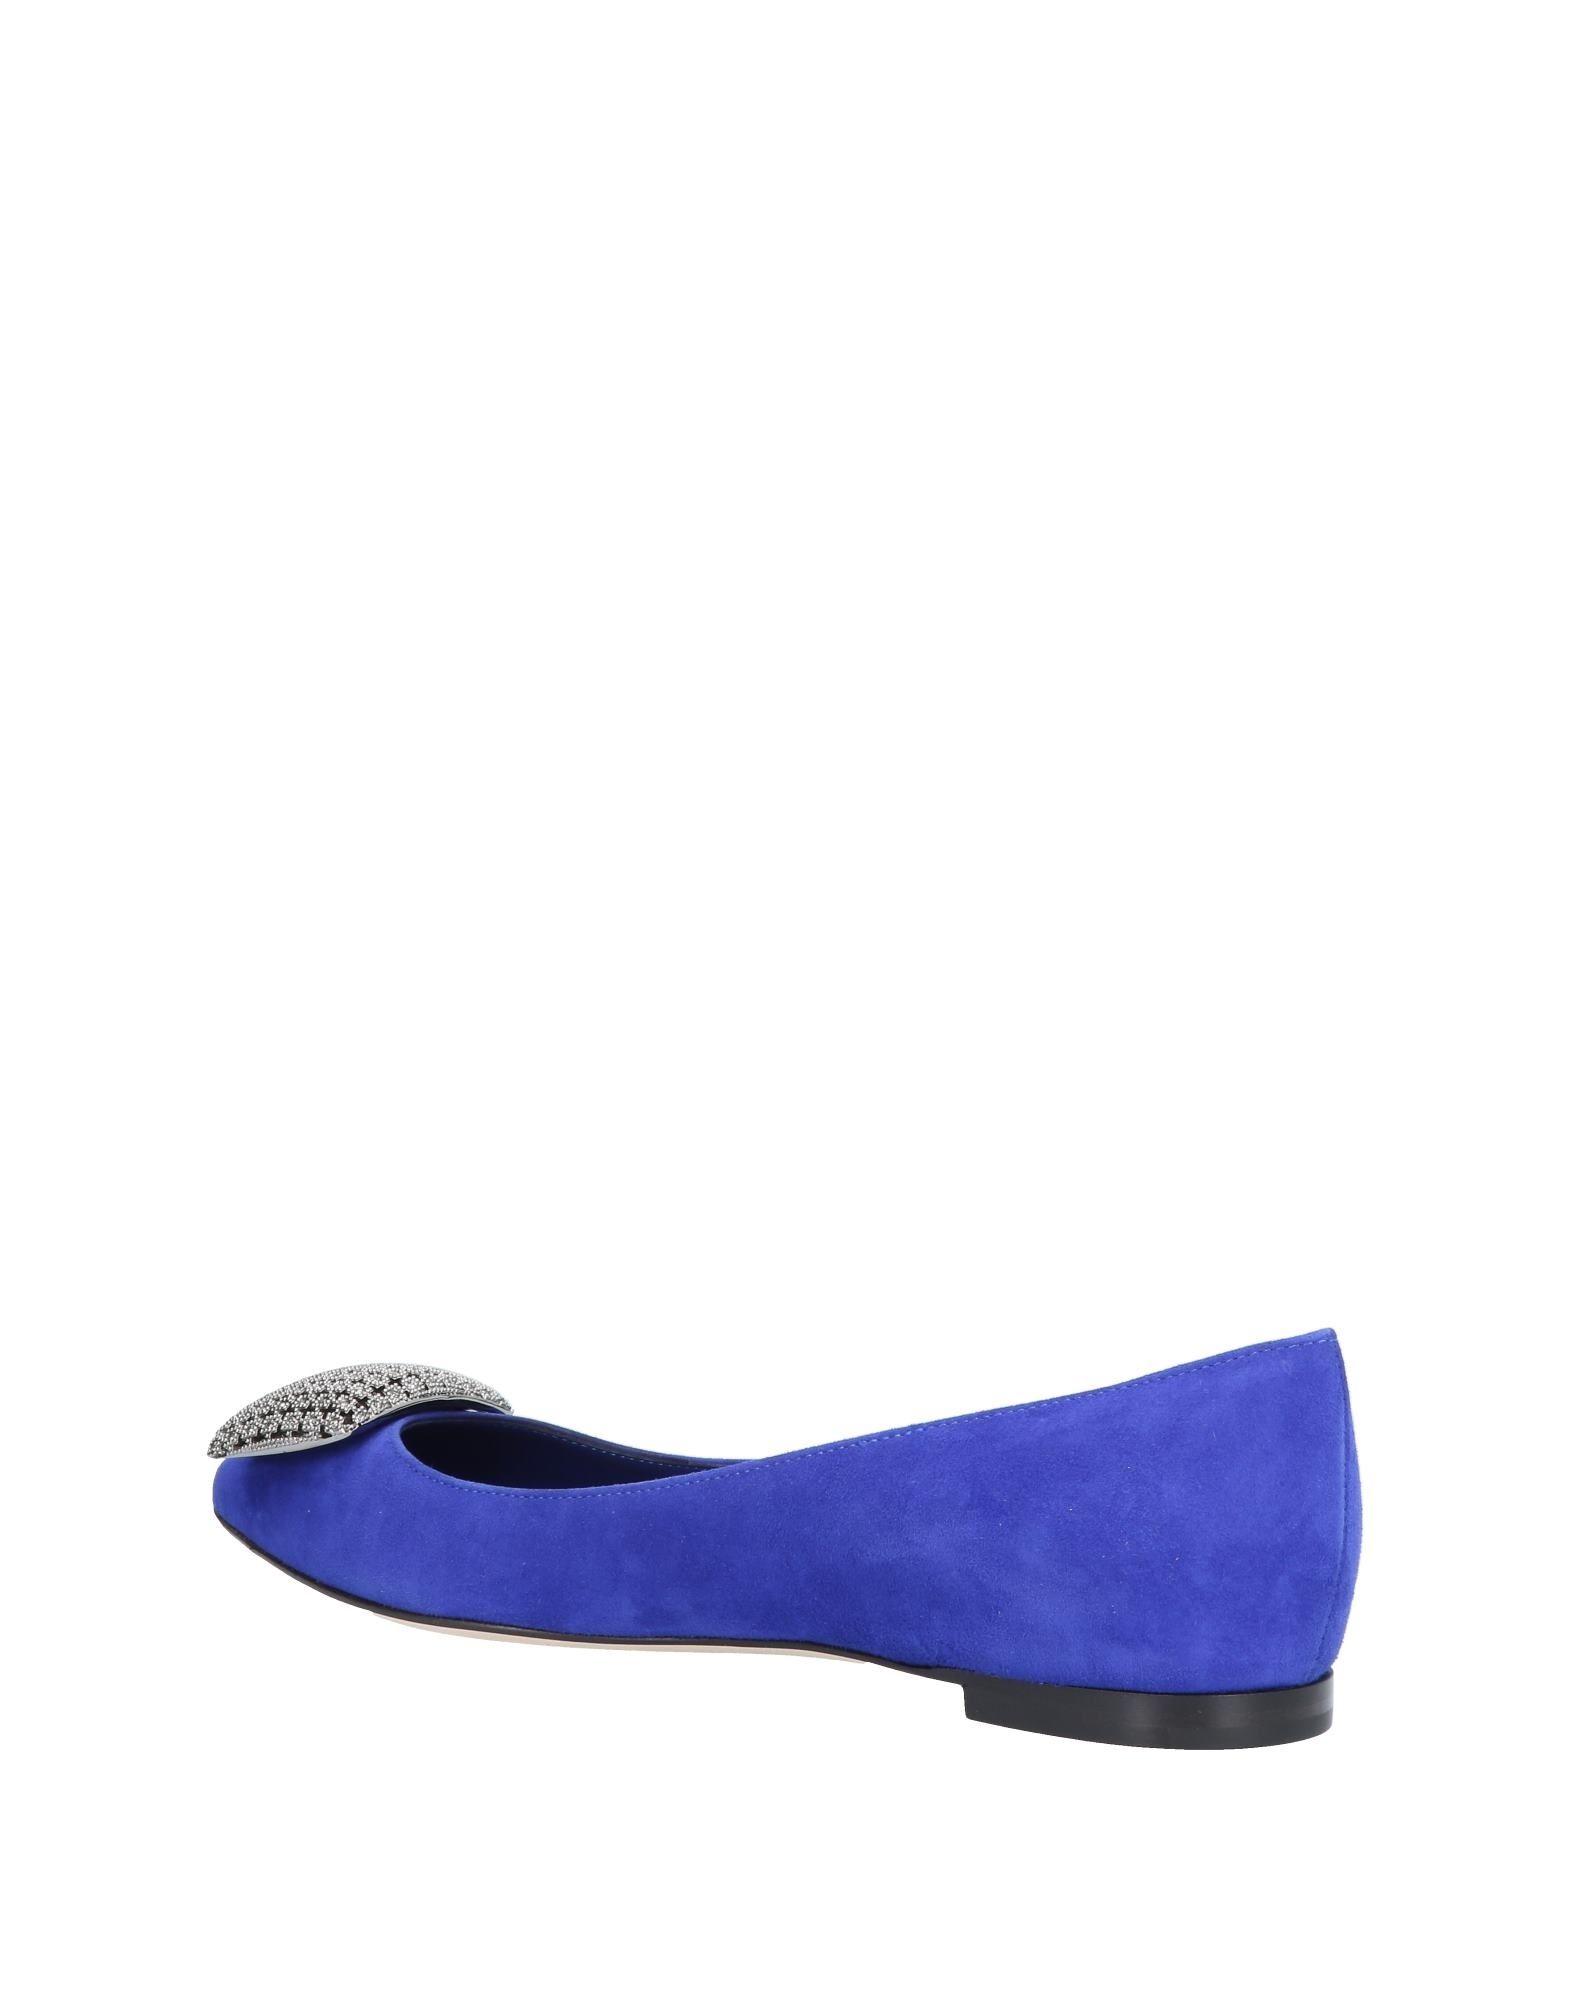 Sergio Rossi Ballerinas Damen  11411944JD Beliebte Schuhe Schuhe Schuhe 9943bb